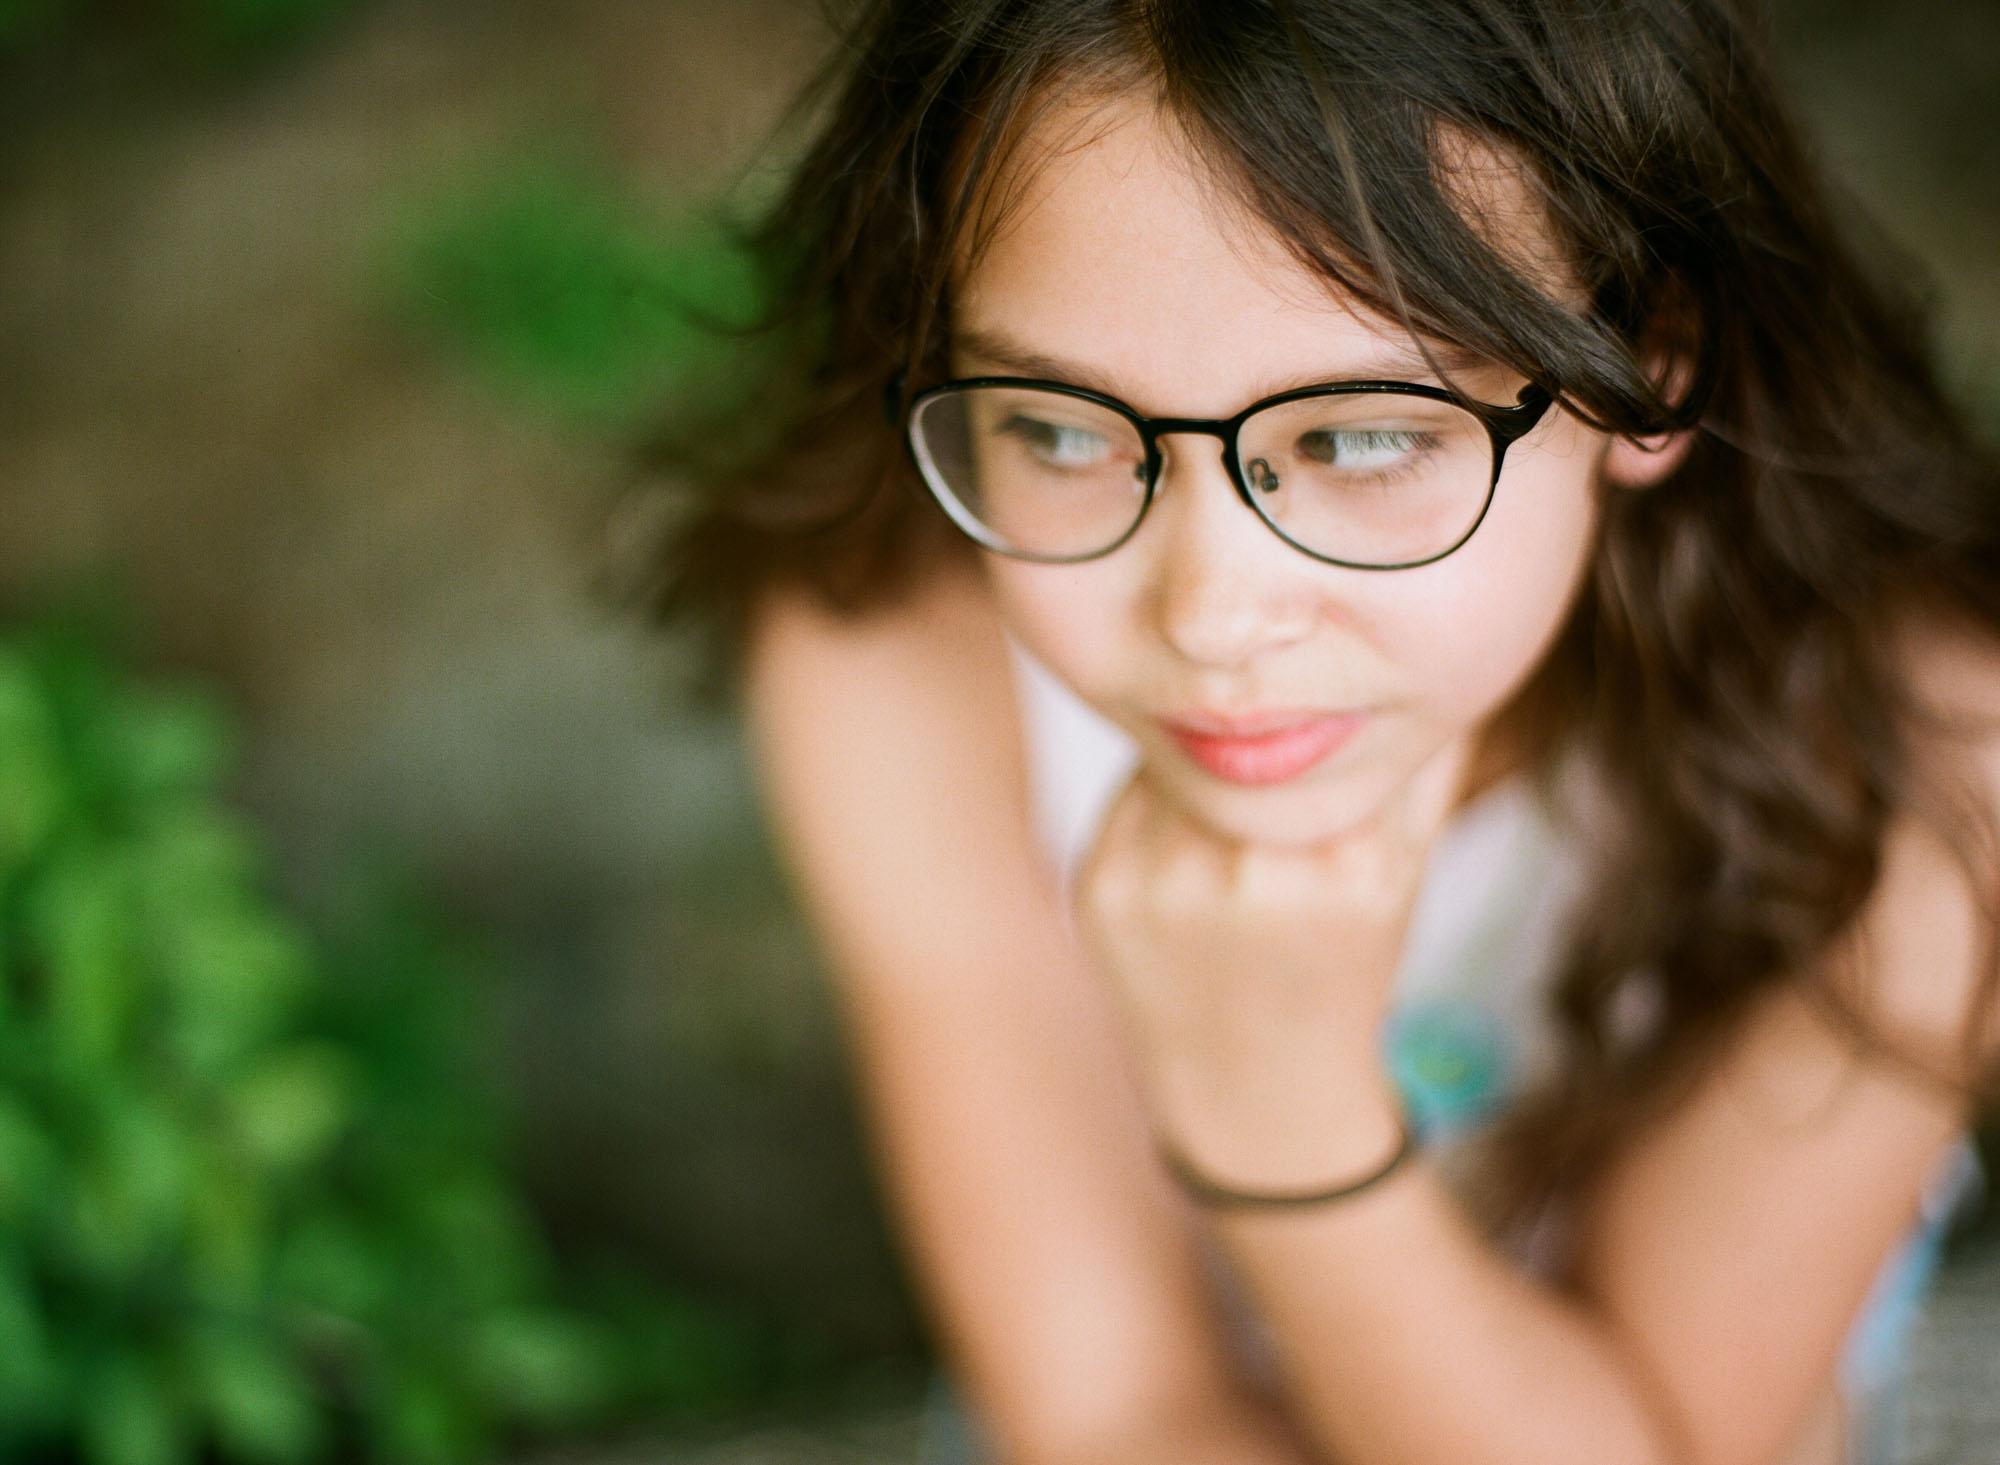 raleigh-family-photographer-studio-milestone-baby-photography-001